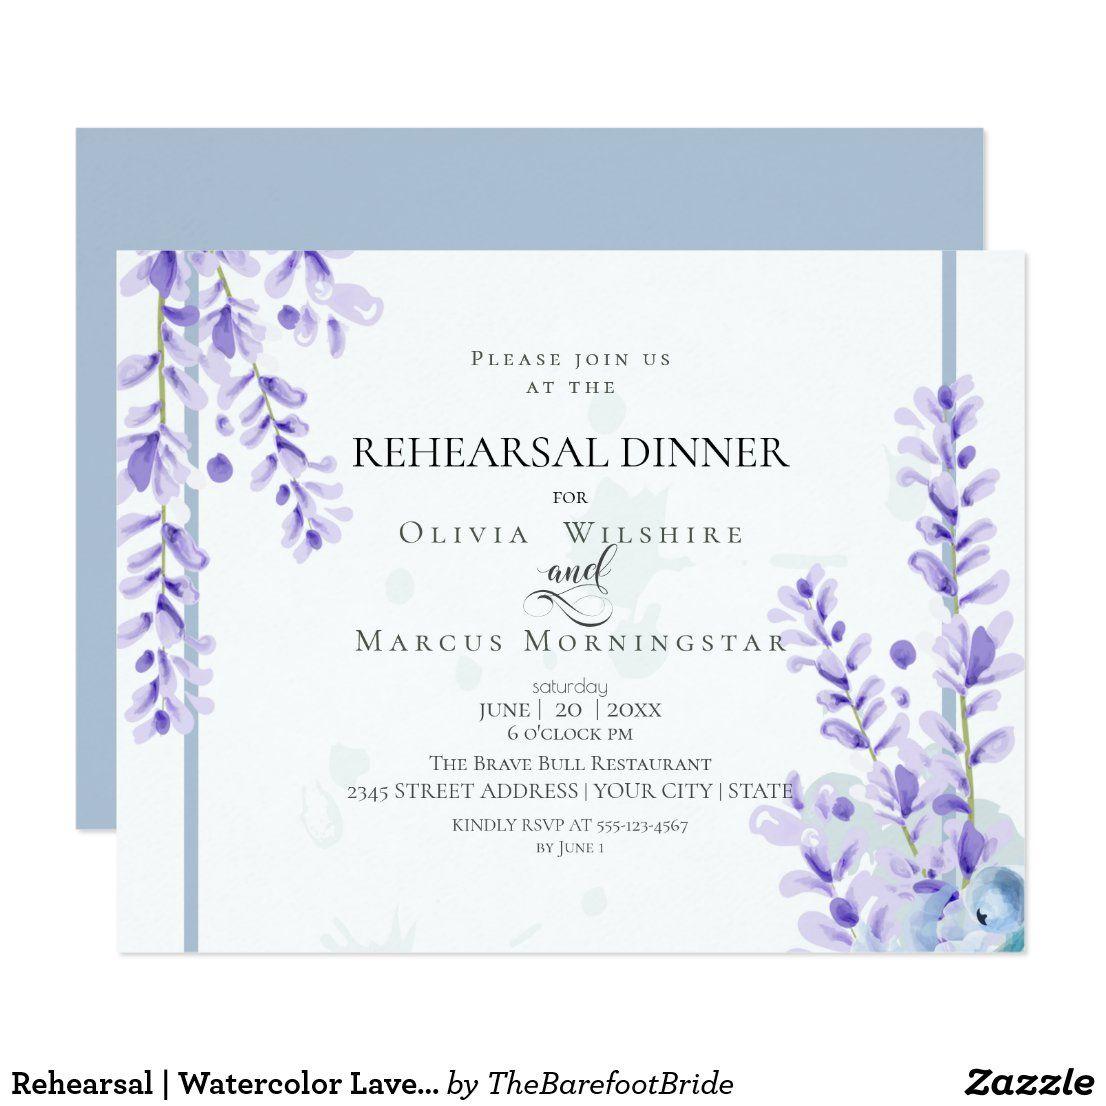 Rehearsal Watercolor Lavender Dusty Blue Floral Invitation Zazzle Com Floral Wedding Invitations Floral Invitation Floral Wedding Stationery